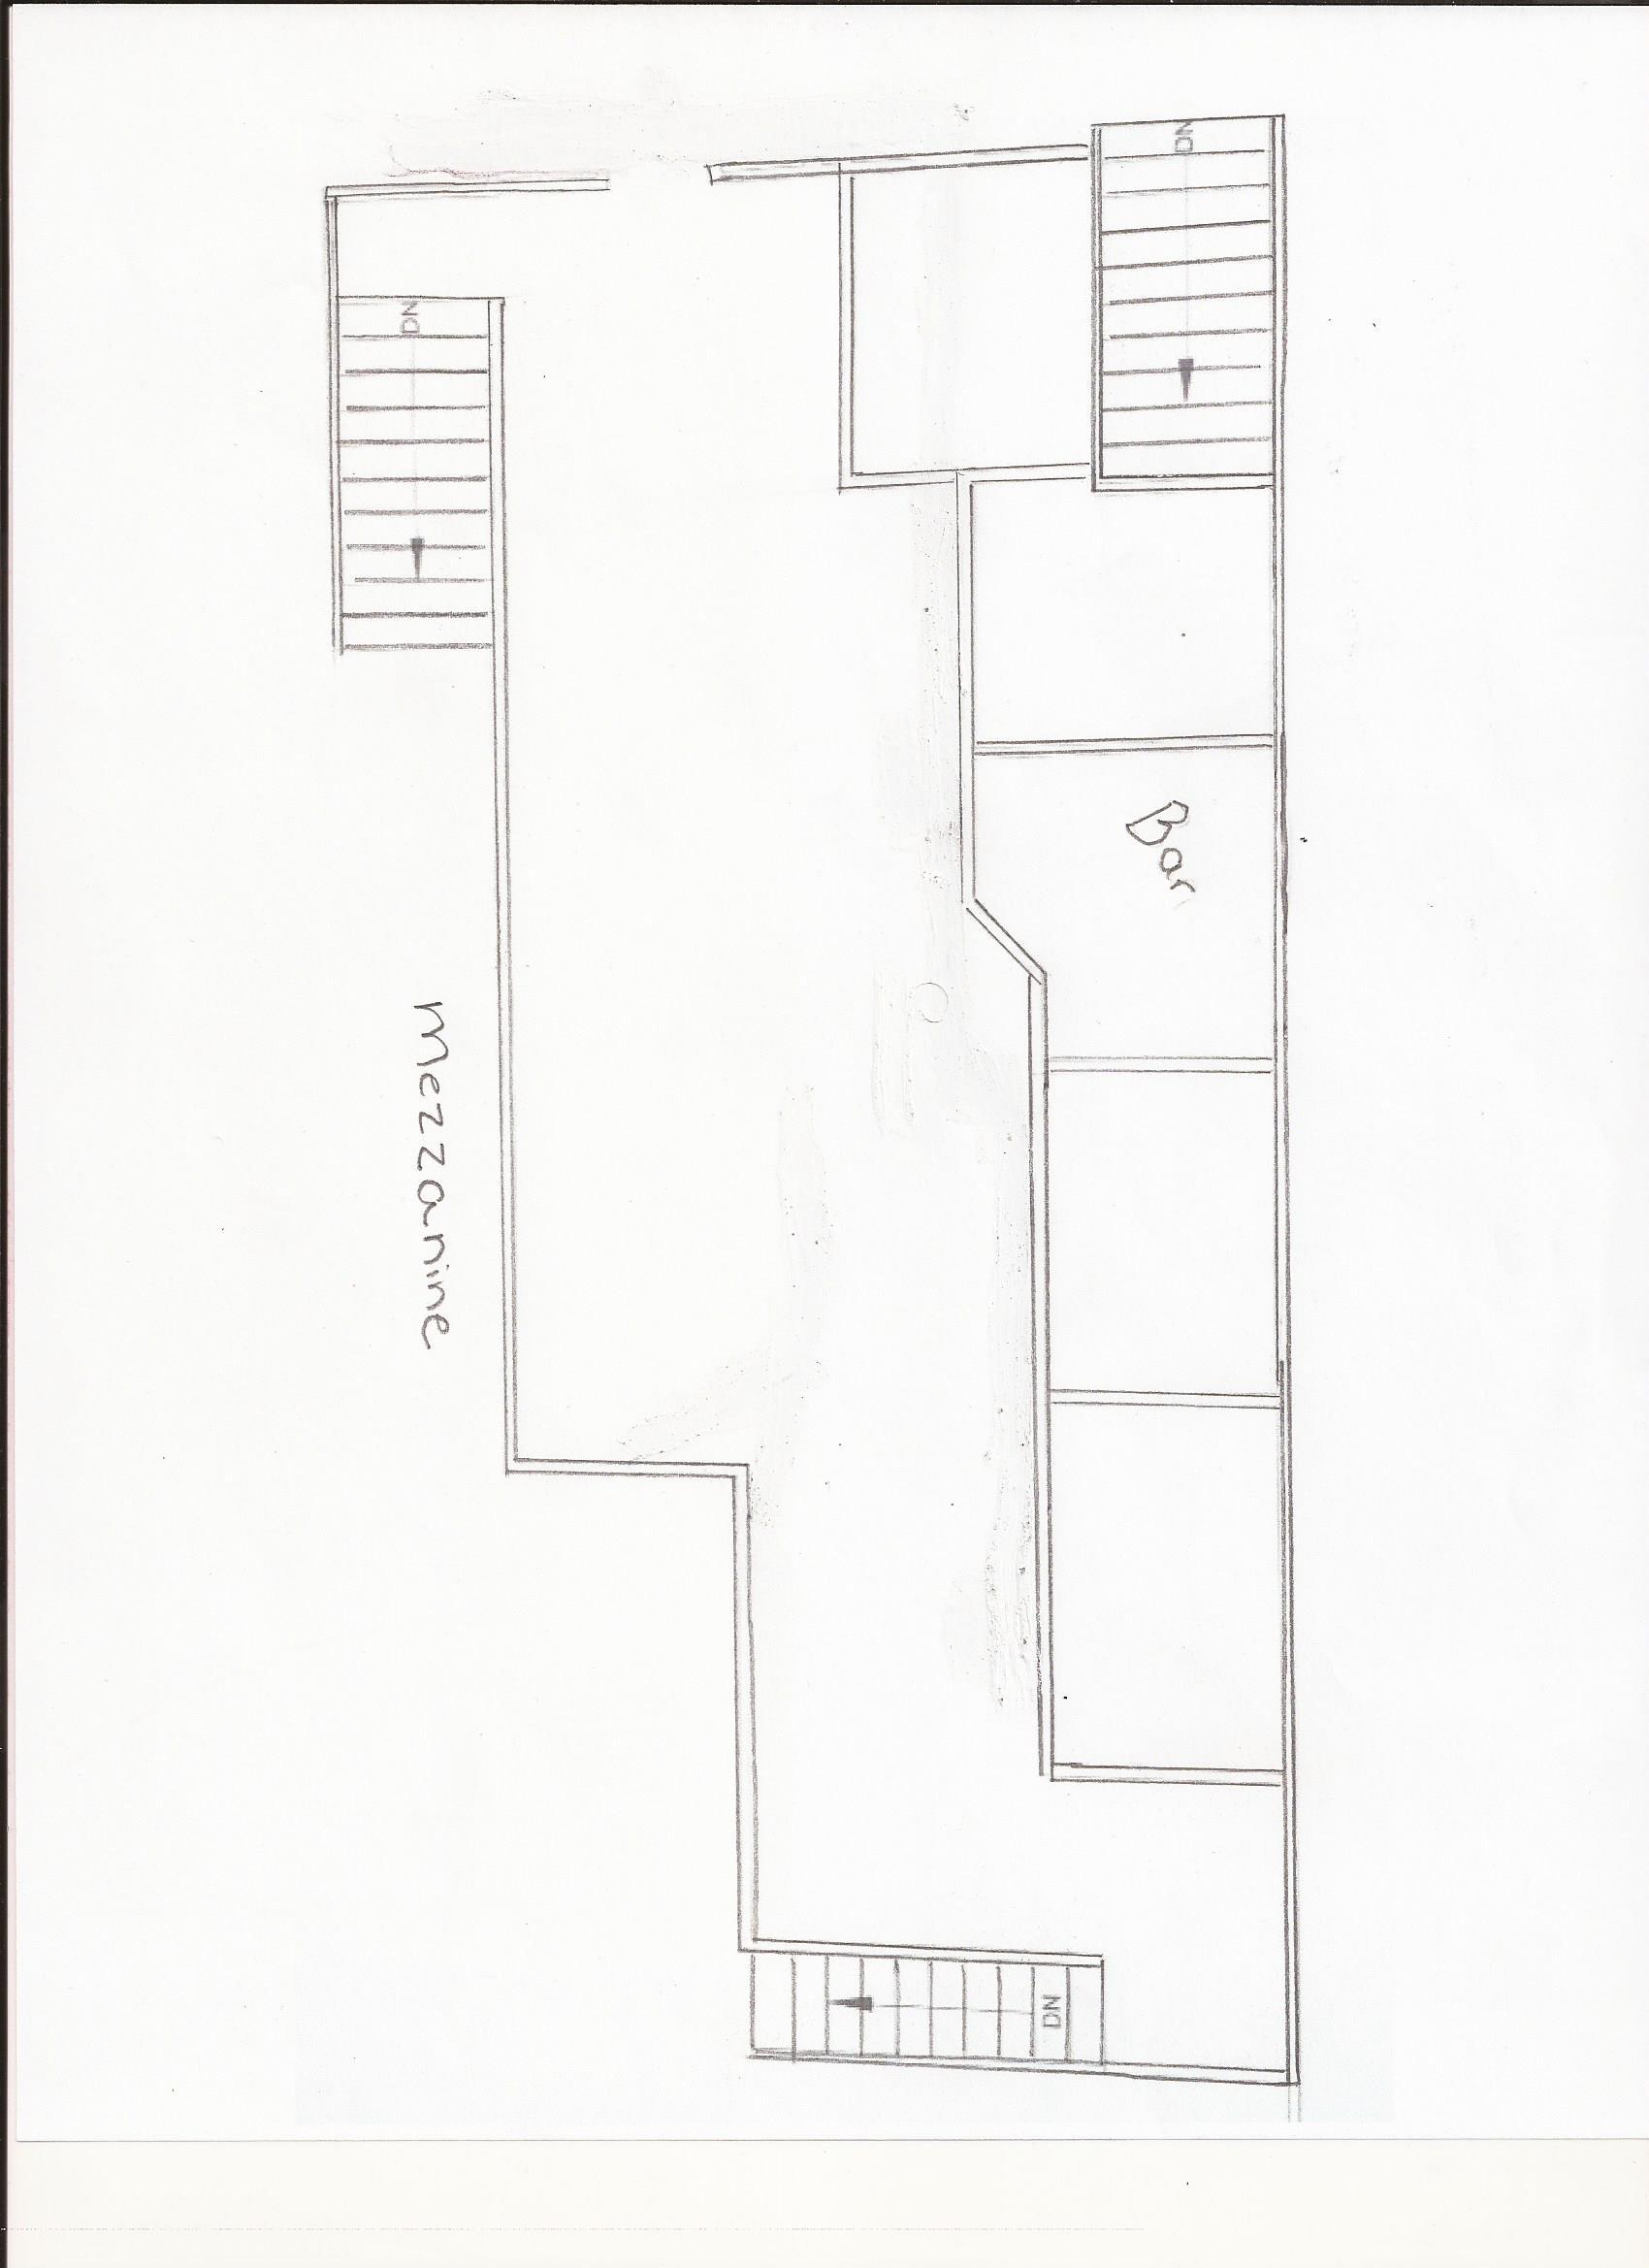 Faq lamar street center for Mezzanine floor plan